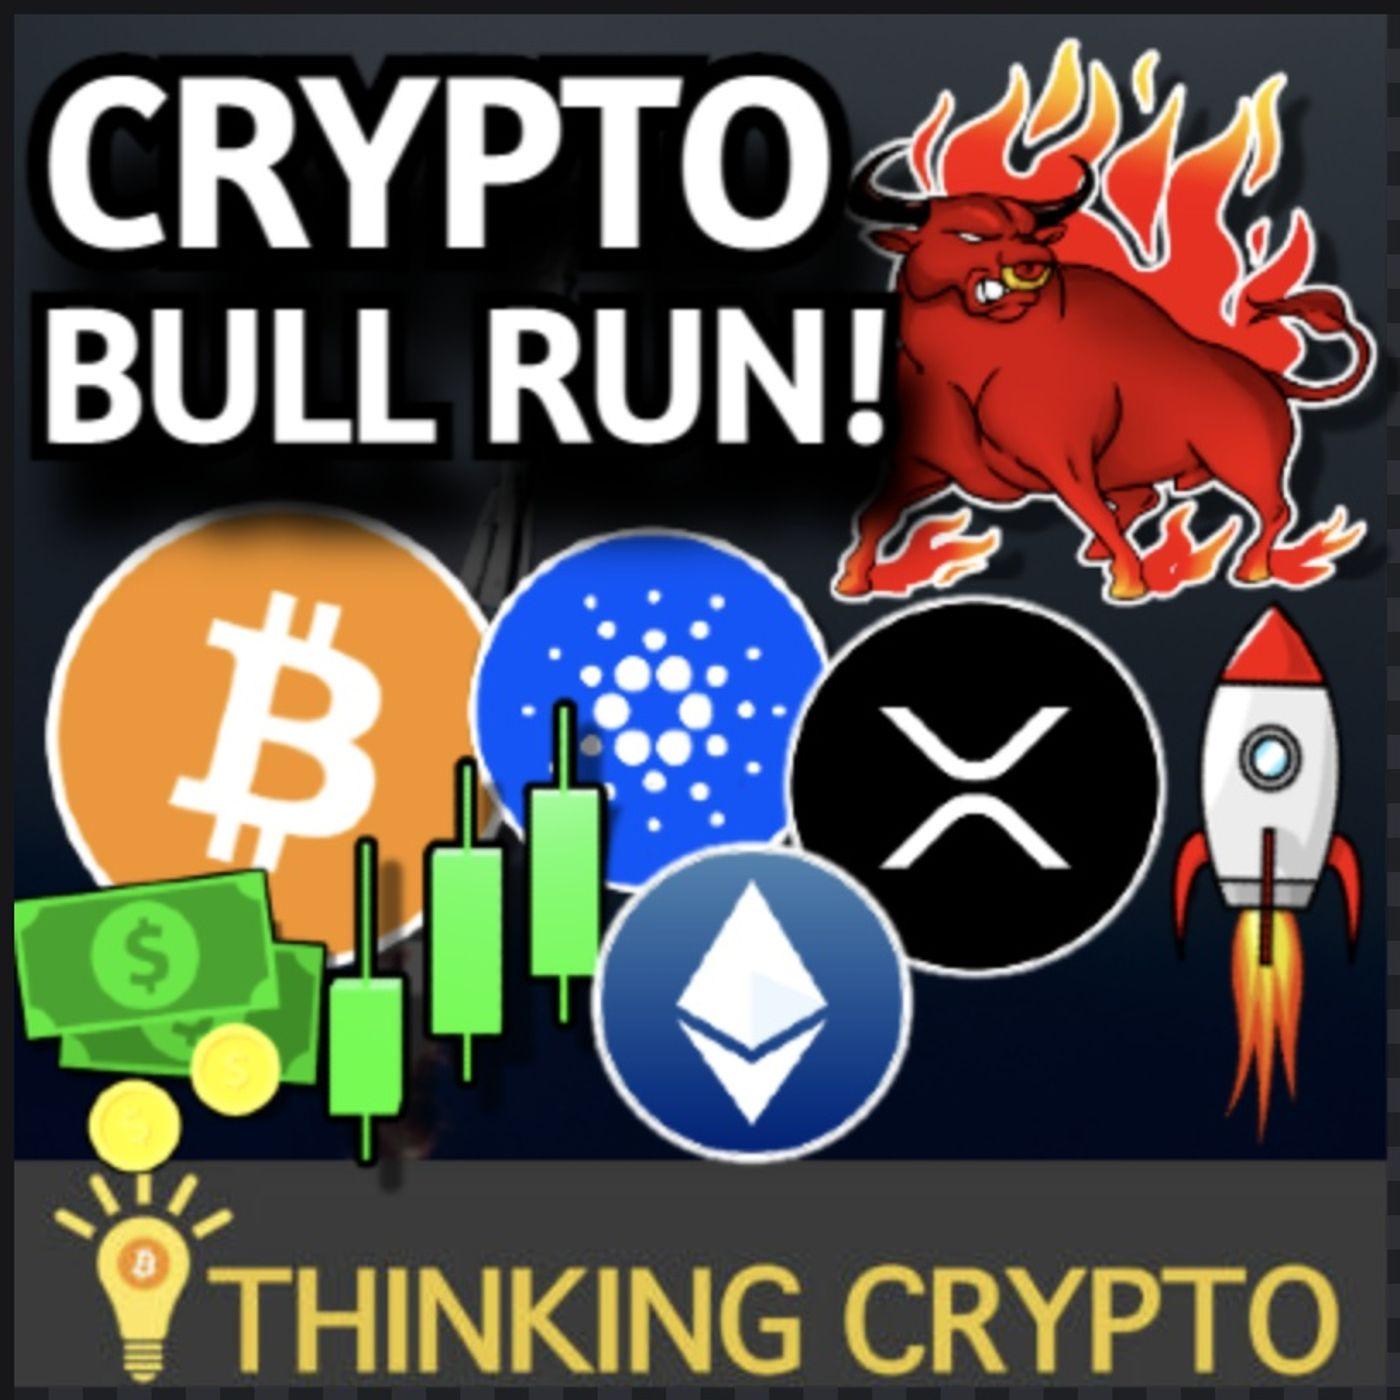 CRYPTO BULL RUN! Bitcoin Breakout - AMC Theaters Crypto - Stellar USDC MoneyGram